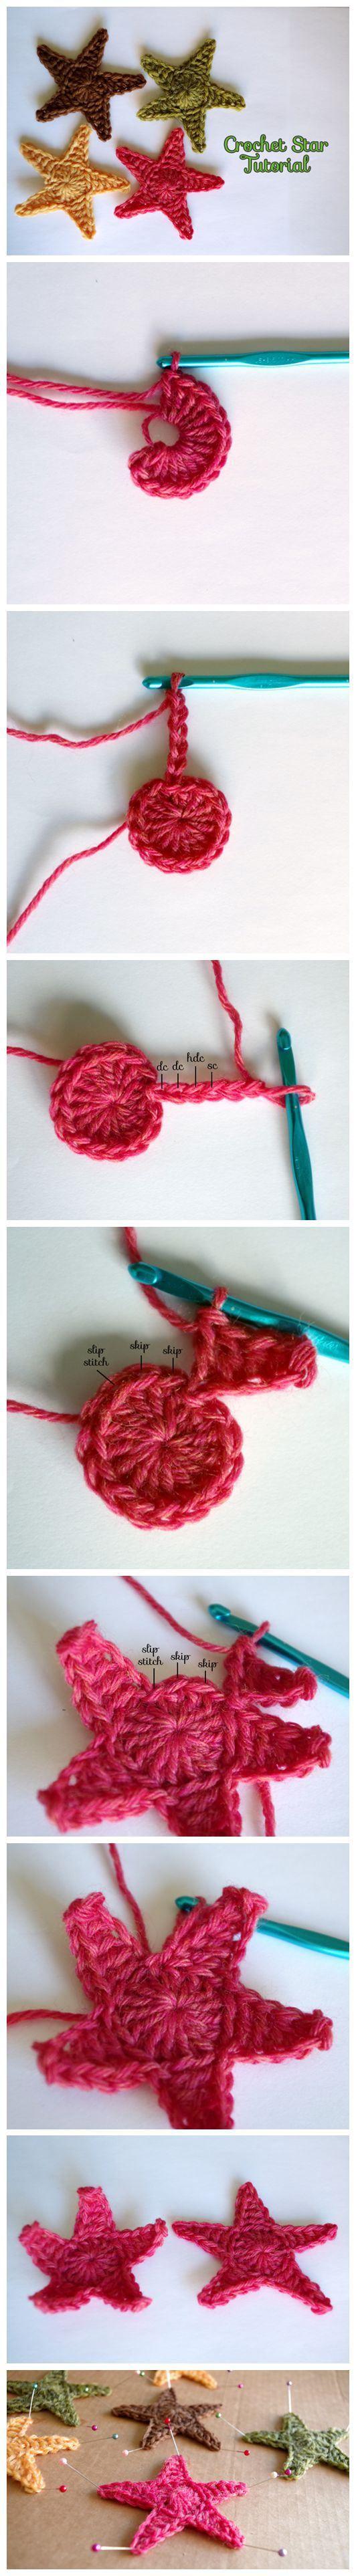 "#Crochet_Tutorials - #Wonderful simple crocheted star tutorial. Great for Christmas ornaments with a loop added, or for garlands."" Enjoy from #KnittingGuru ** http://www.pinterest.com/KnittingGuru"